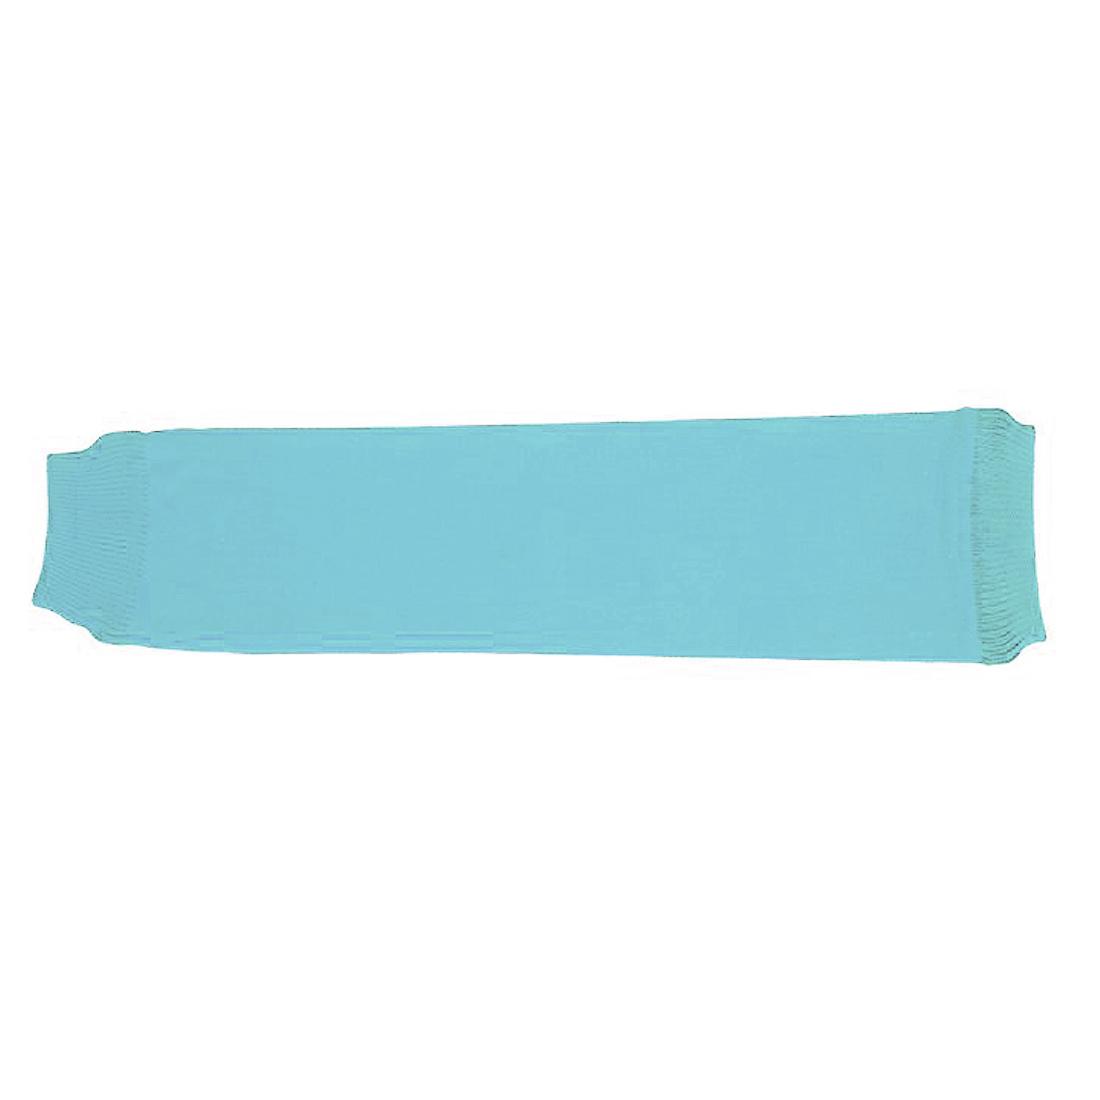 Light Blue Elastic Cotton Basketball Sports Arm Sleeves UV Sun Cover Sprain Protection